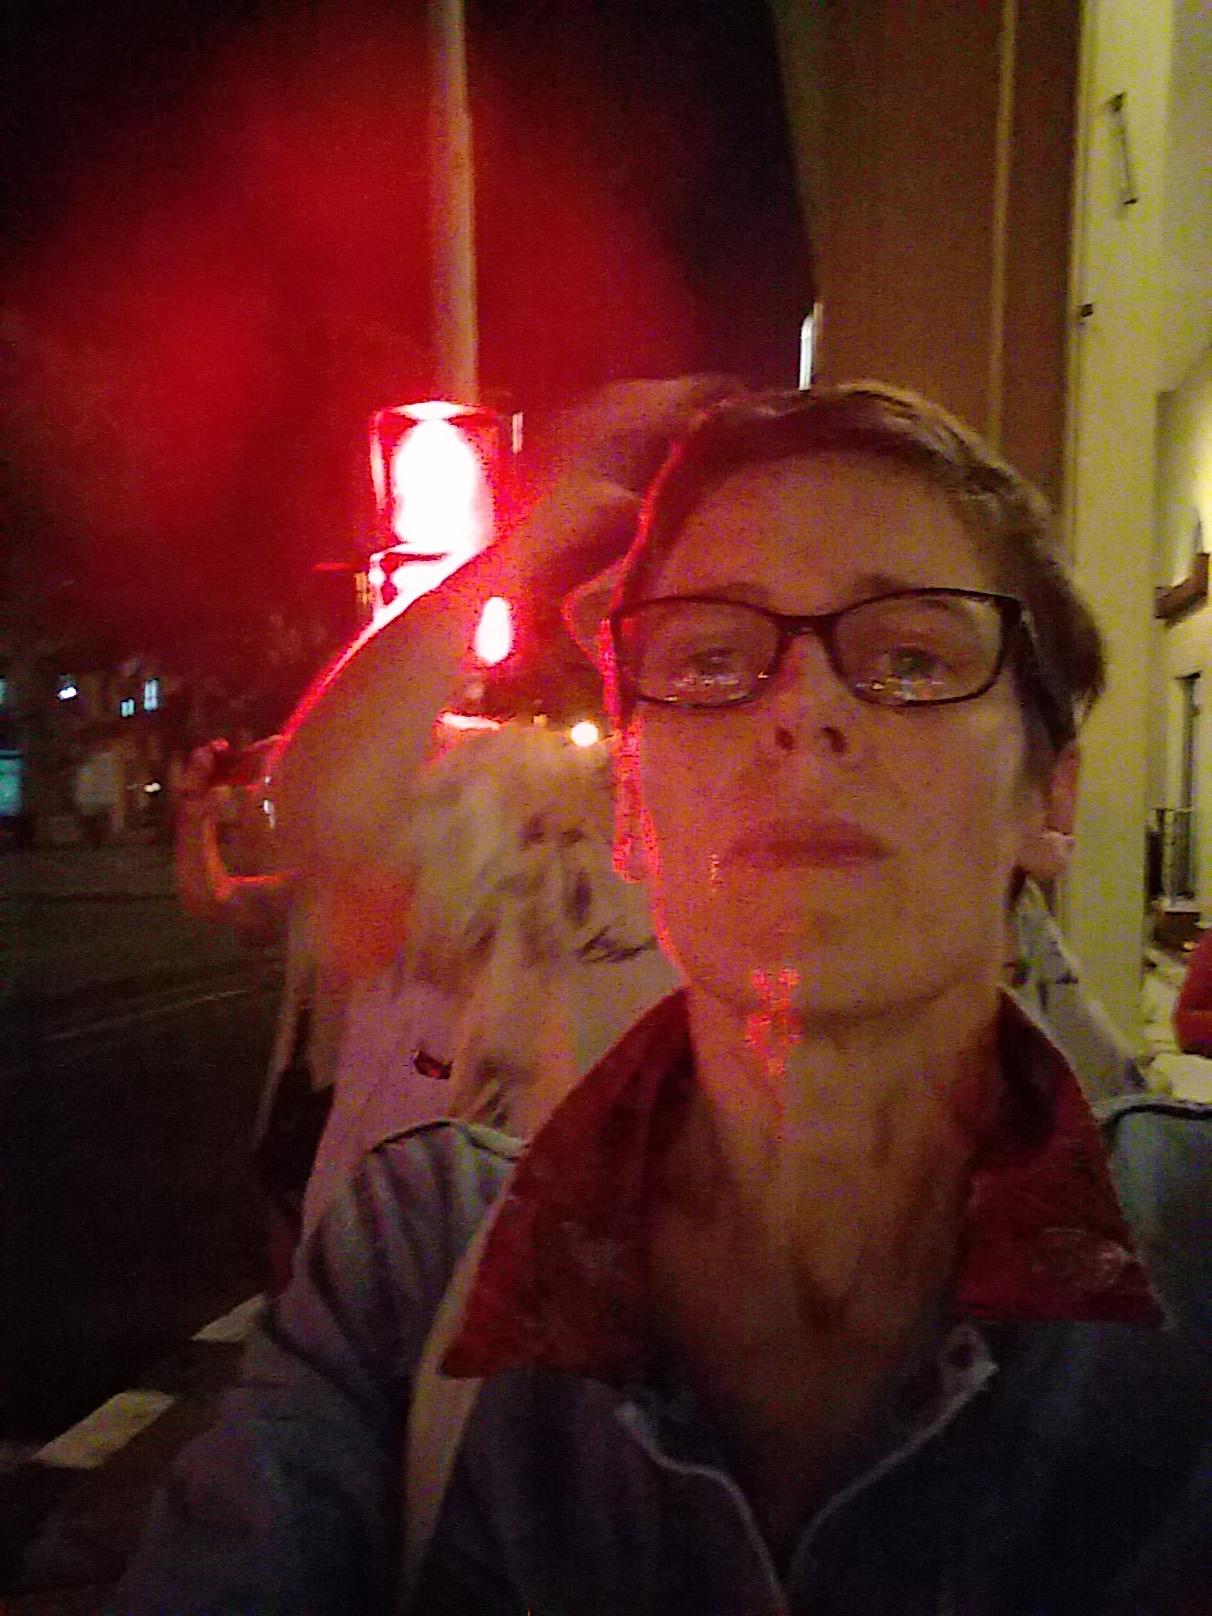 Selfie, from Knee's first night in Havana